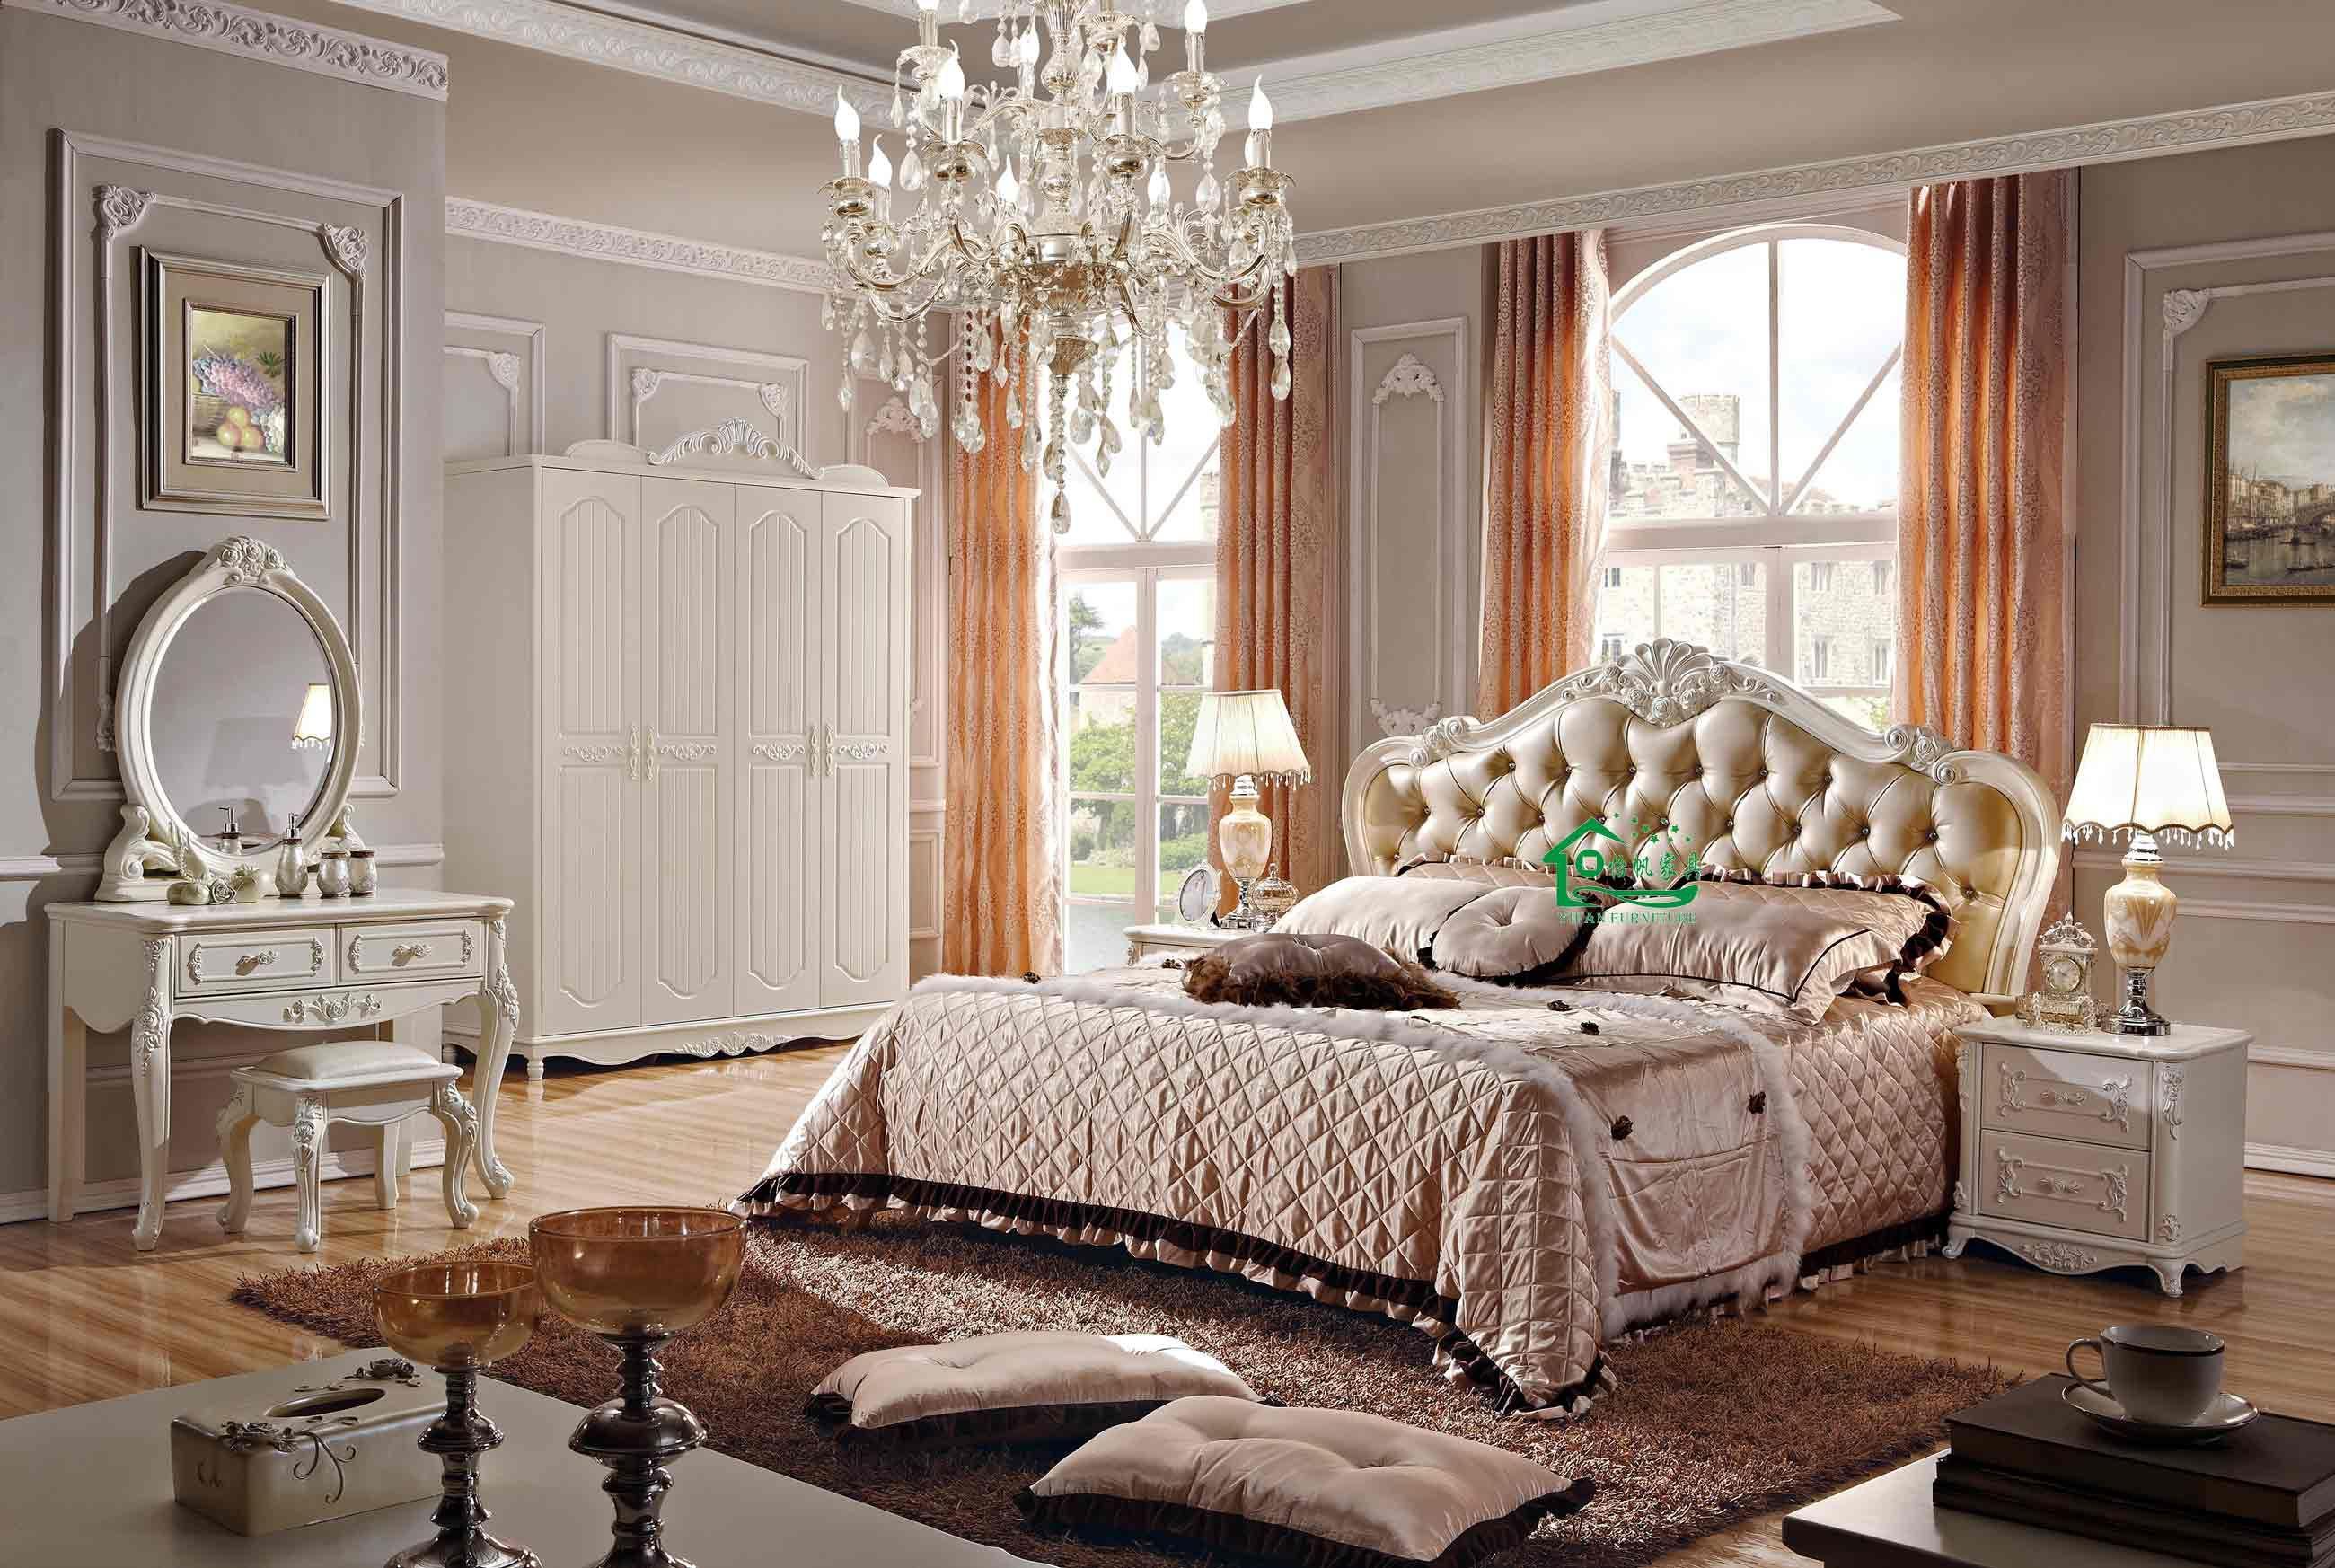 Lovely Classic Bedroom Furniture #2: Classic Bedroom - Căutare Google | Bedroom Ideas 2 | Pinterest | Classic Bedroom Furniture, Bedroom Furniture And Google